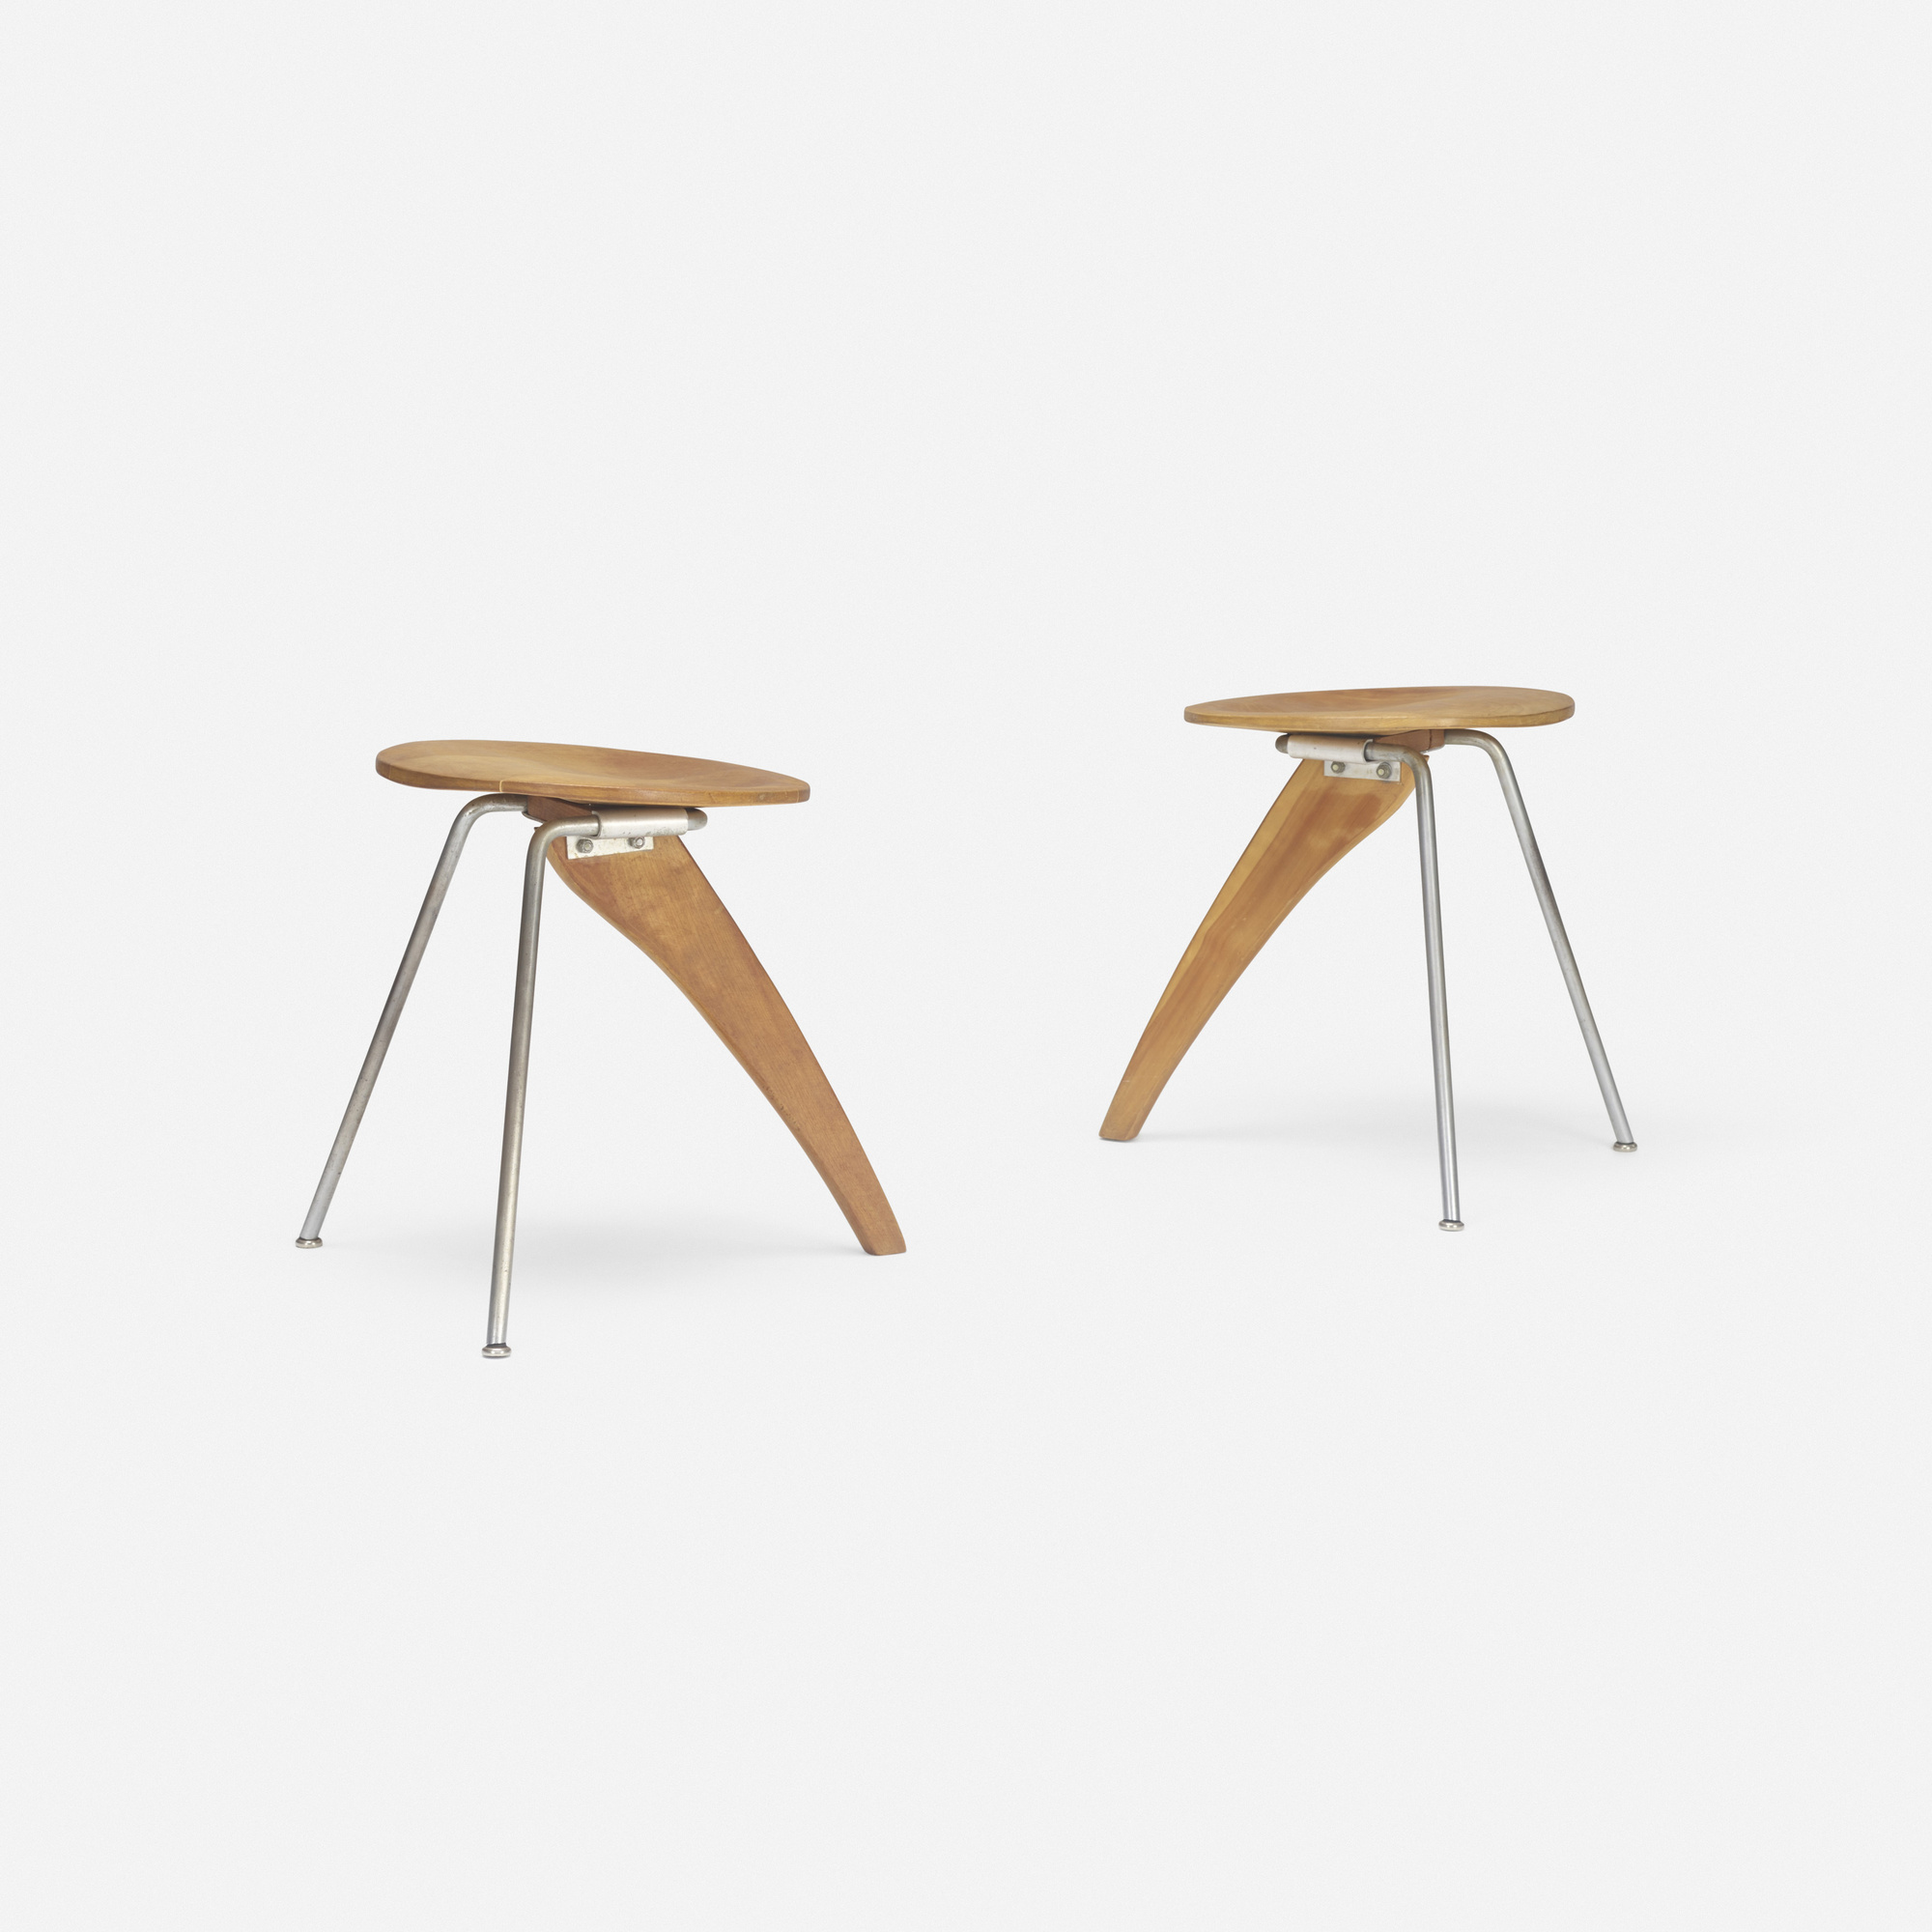 190: Isamu Noguchi / Rudder stools model IN-22, pair (2 of 3)